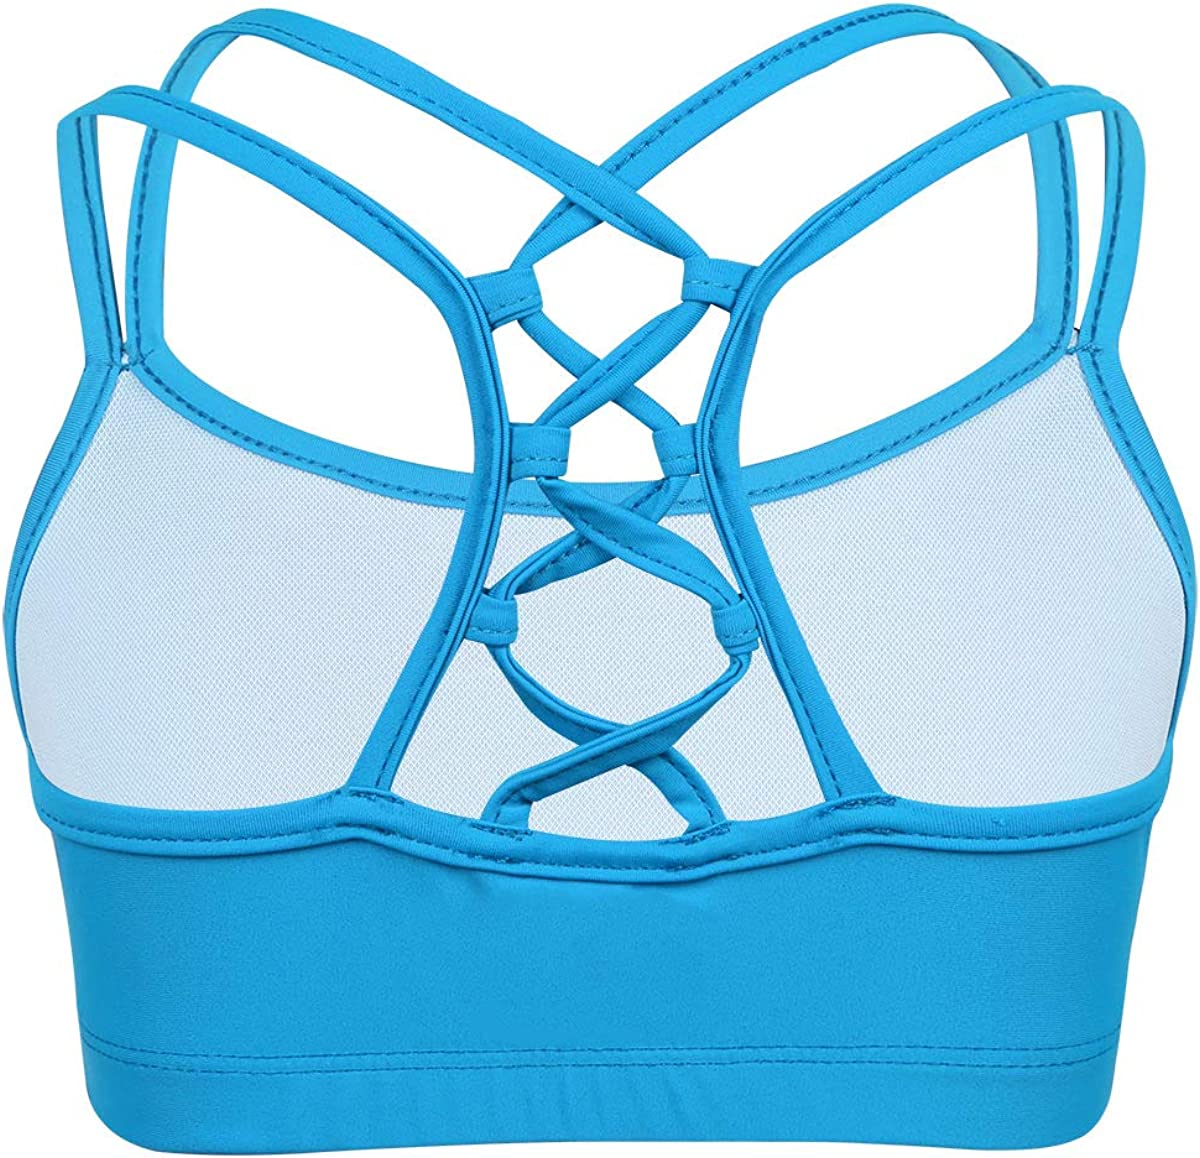 CHICTRY Child Big Girls Active Multi-Straps Slim Fit Camisole Dance Crop Top Training Bra